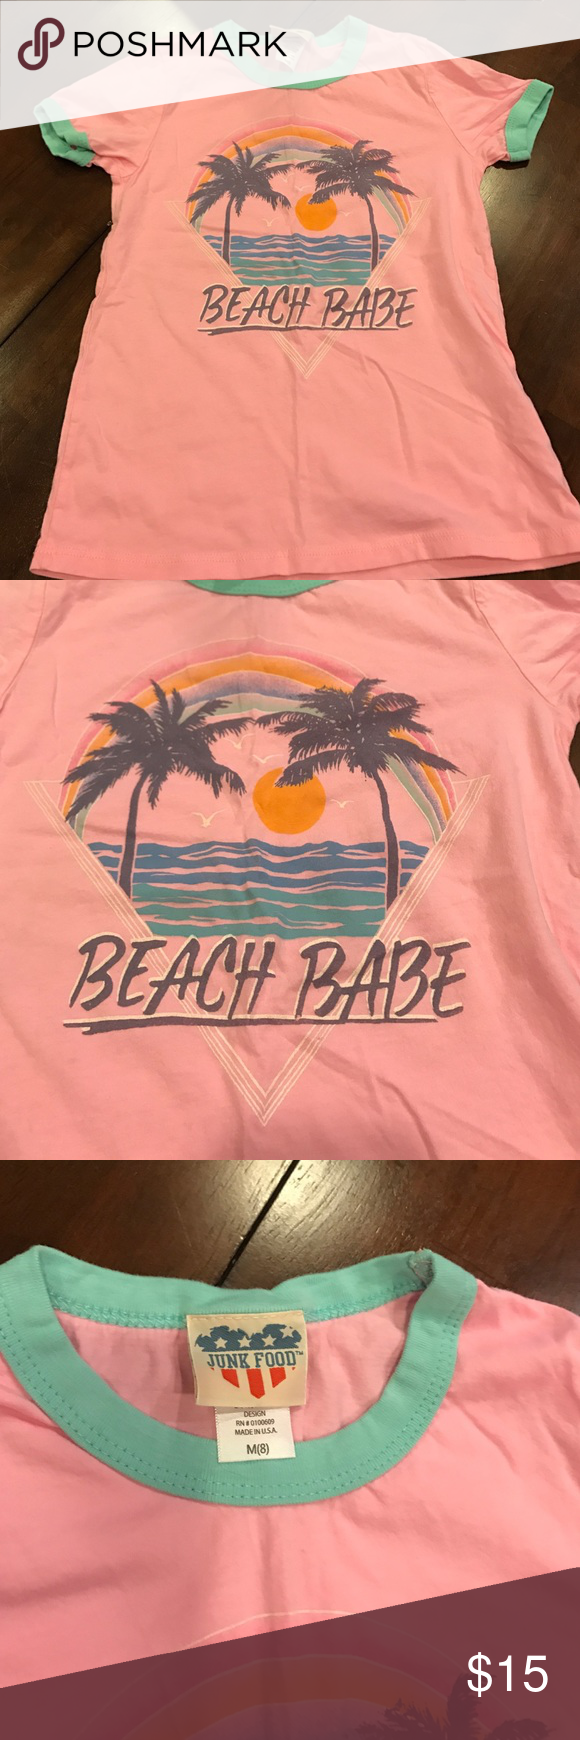 "Junk food tee Pink ""beach babe"" tee with aqua collar/sleeves. Palm trees and sunset Junk Food Shirts & Tops Tees - Short Sleeve"